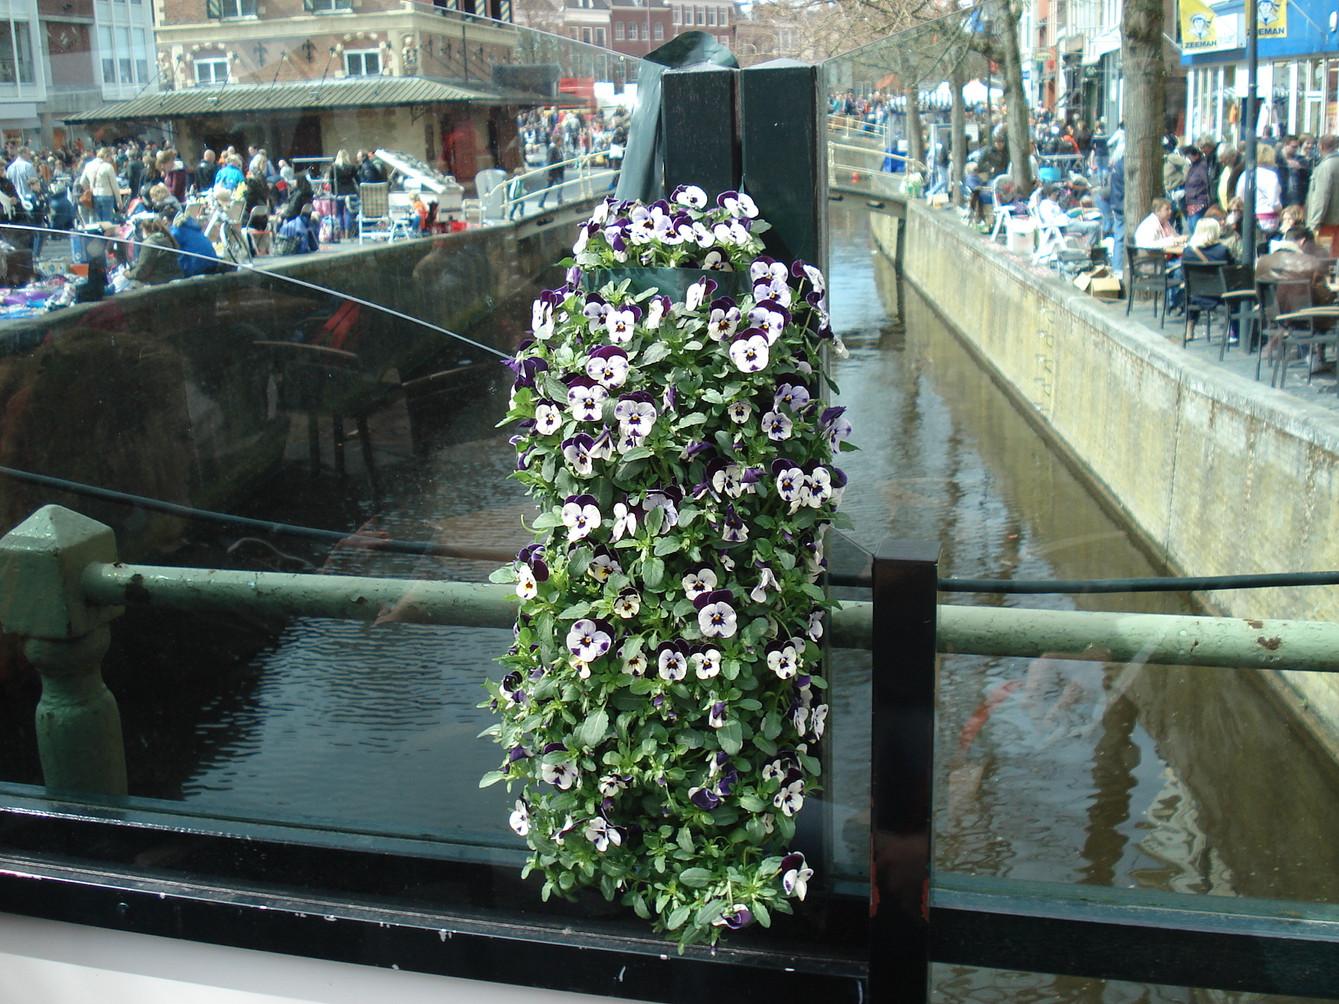 Violas in Leeuwarden, NL